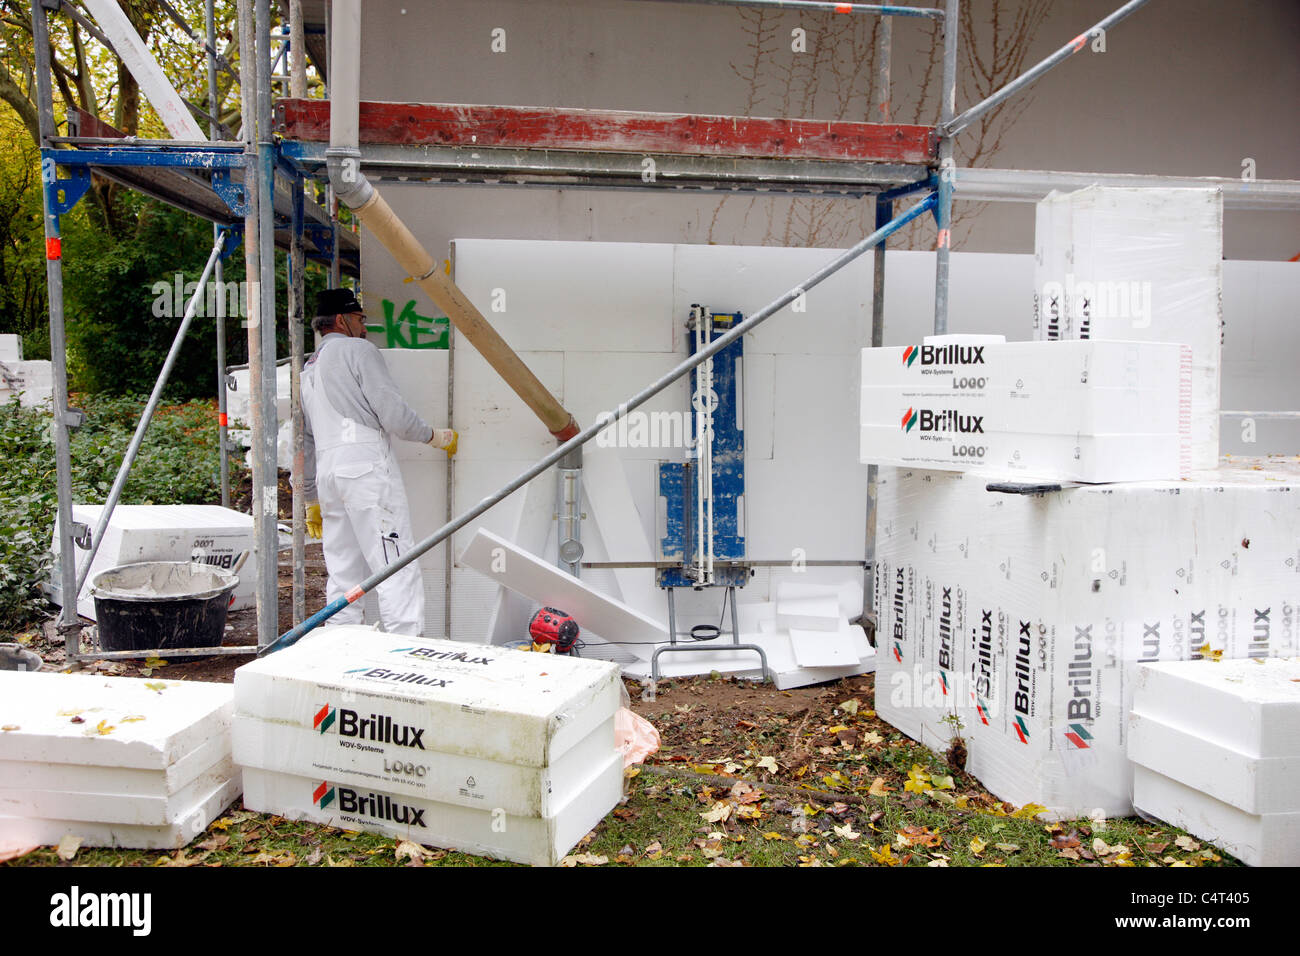 heat insulation of a building for saving energy styrofoam panels stockfoto lizenzfreies bild. Black Bedroom Furniture Sets. Home Design Ideas